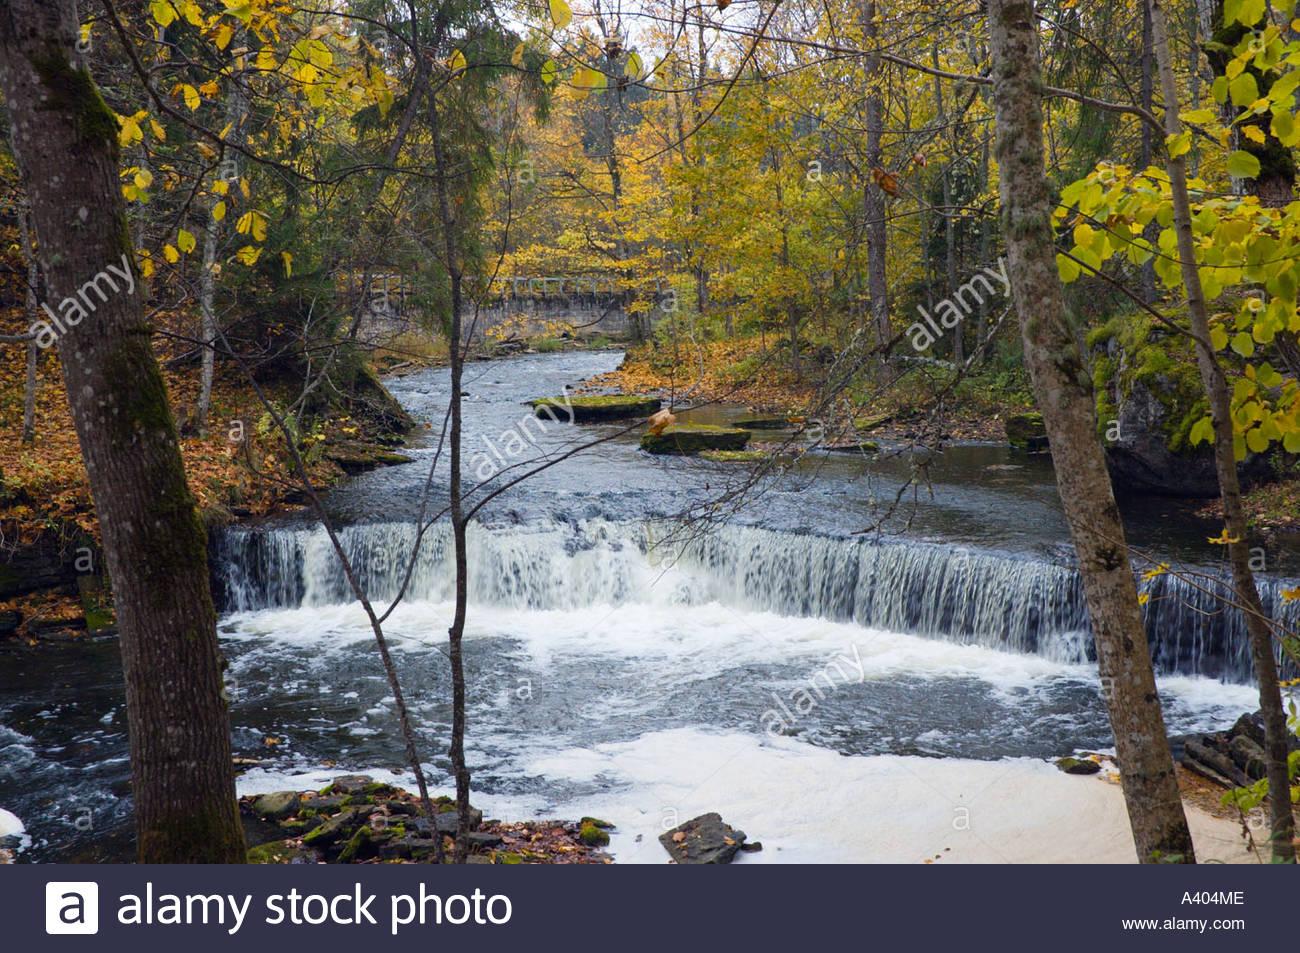 Europe eu estonia lahemaa national park nommeveski n mmeveski waterfall river valgejogi valgej gi